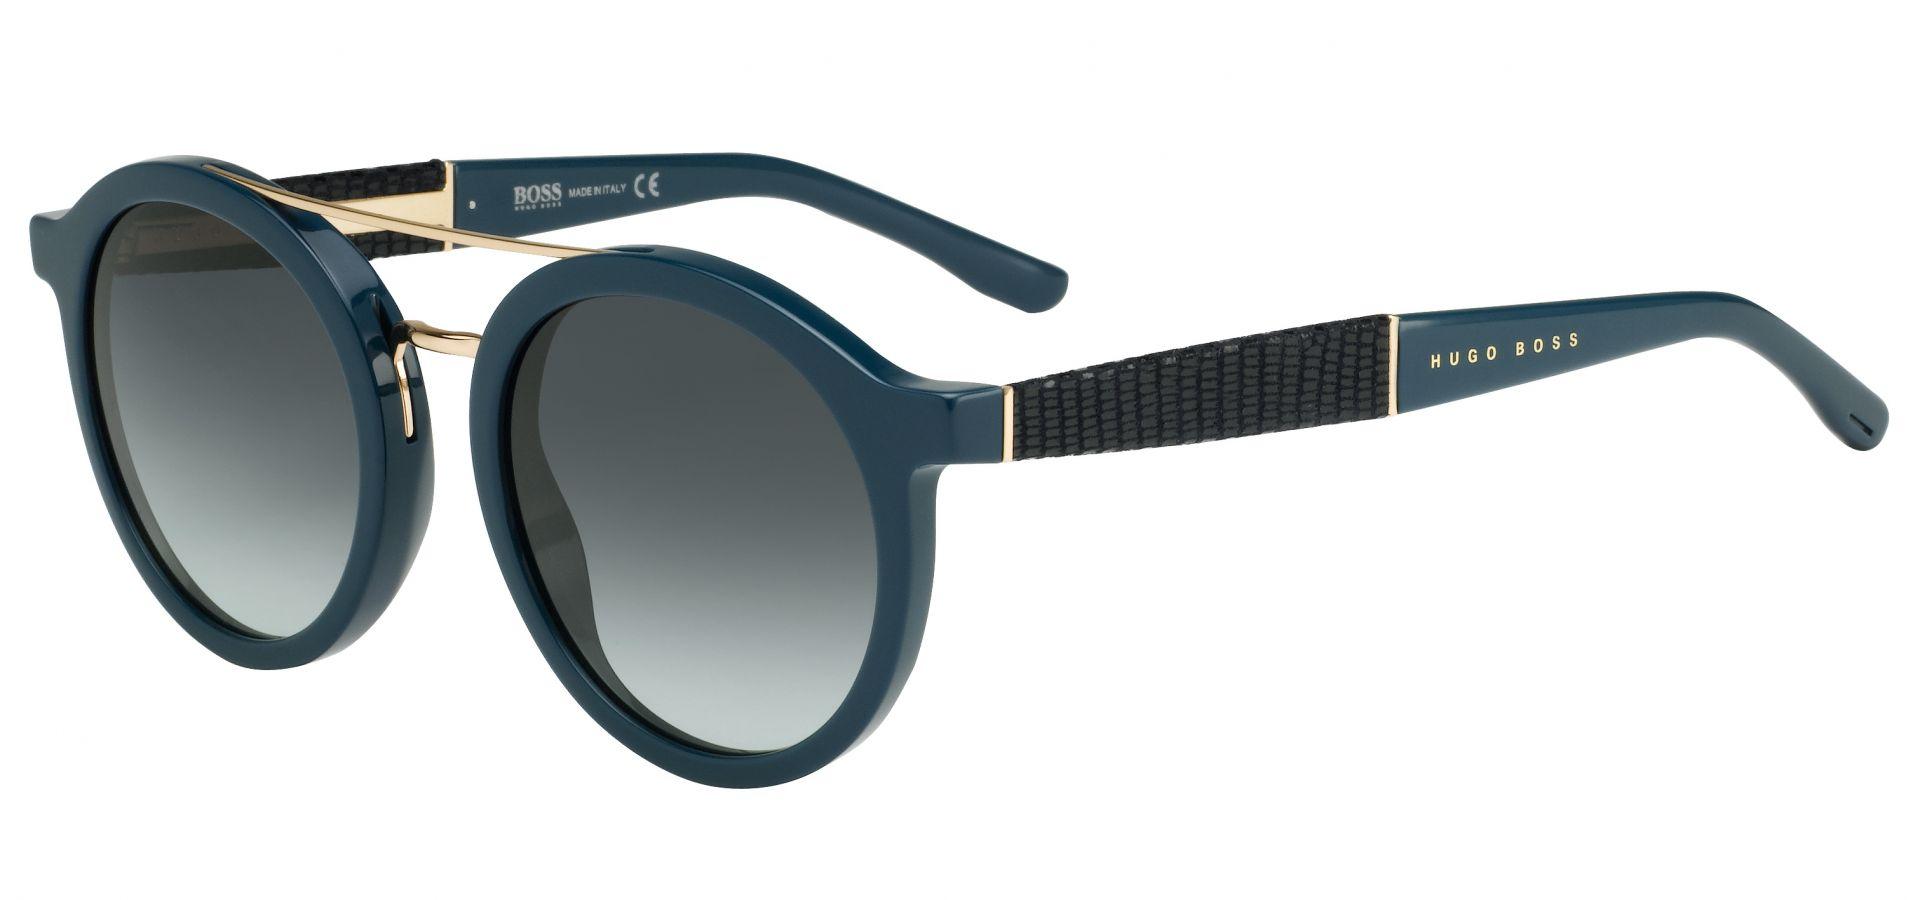 ... Sunčane naočale Hugo Boss HUB0853  Boja  Grey Blue, Veličina  50 21 31dbec4b767d